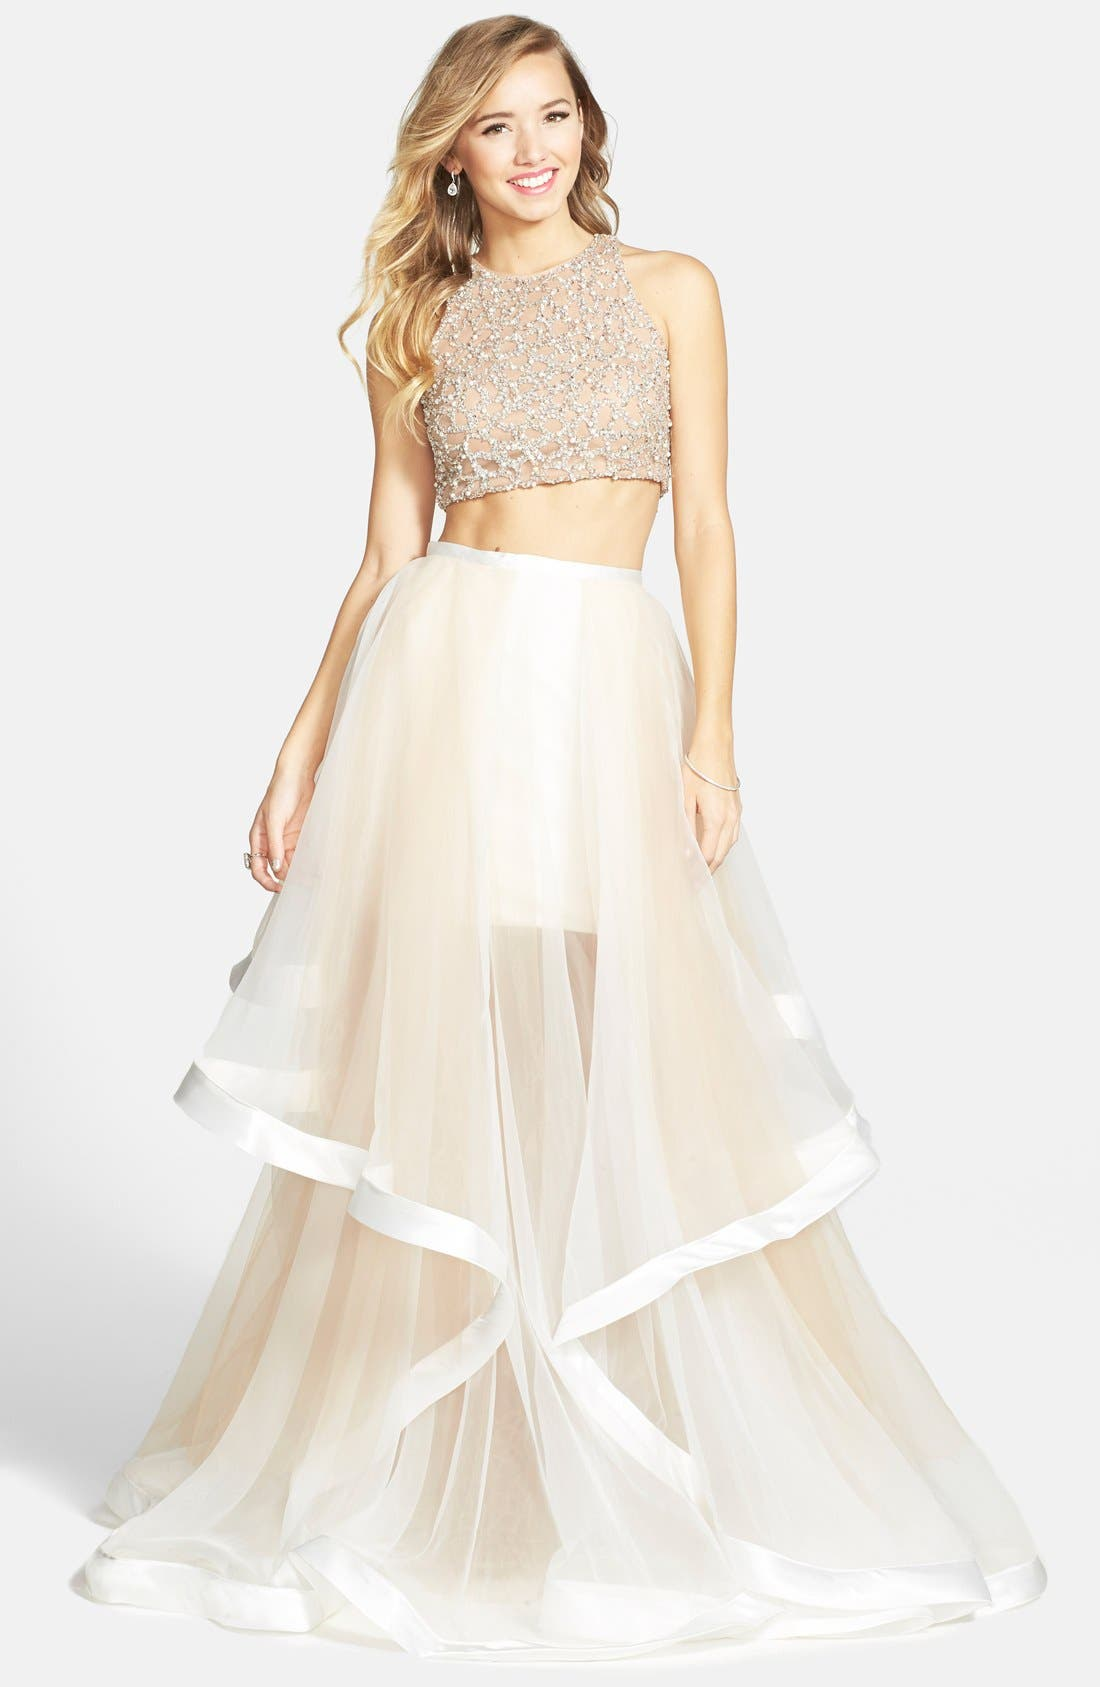 Nordstrom 2 Piece Dress